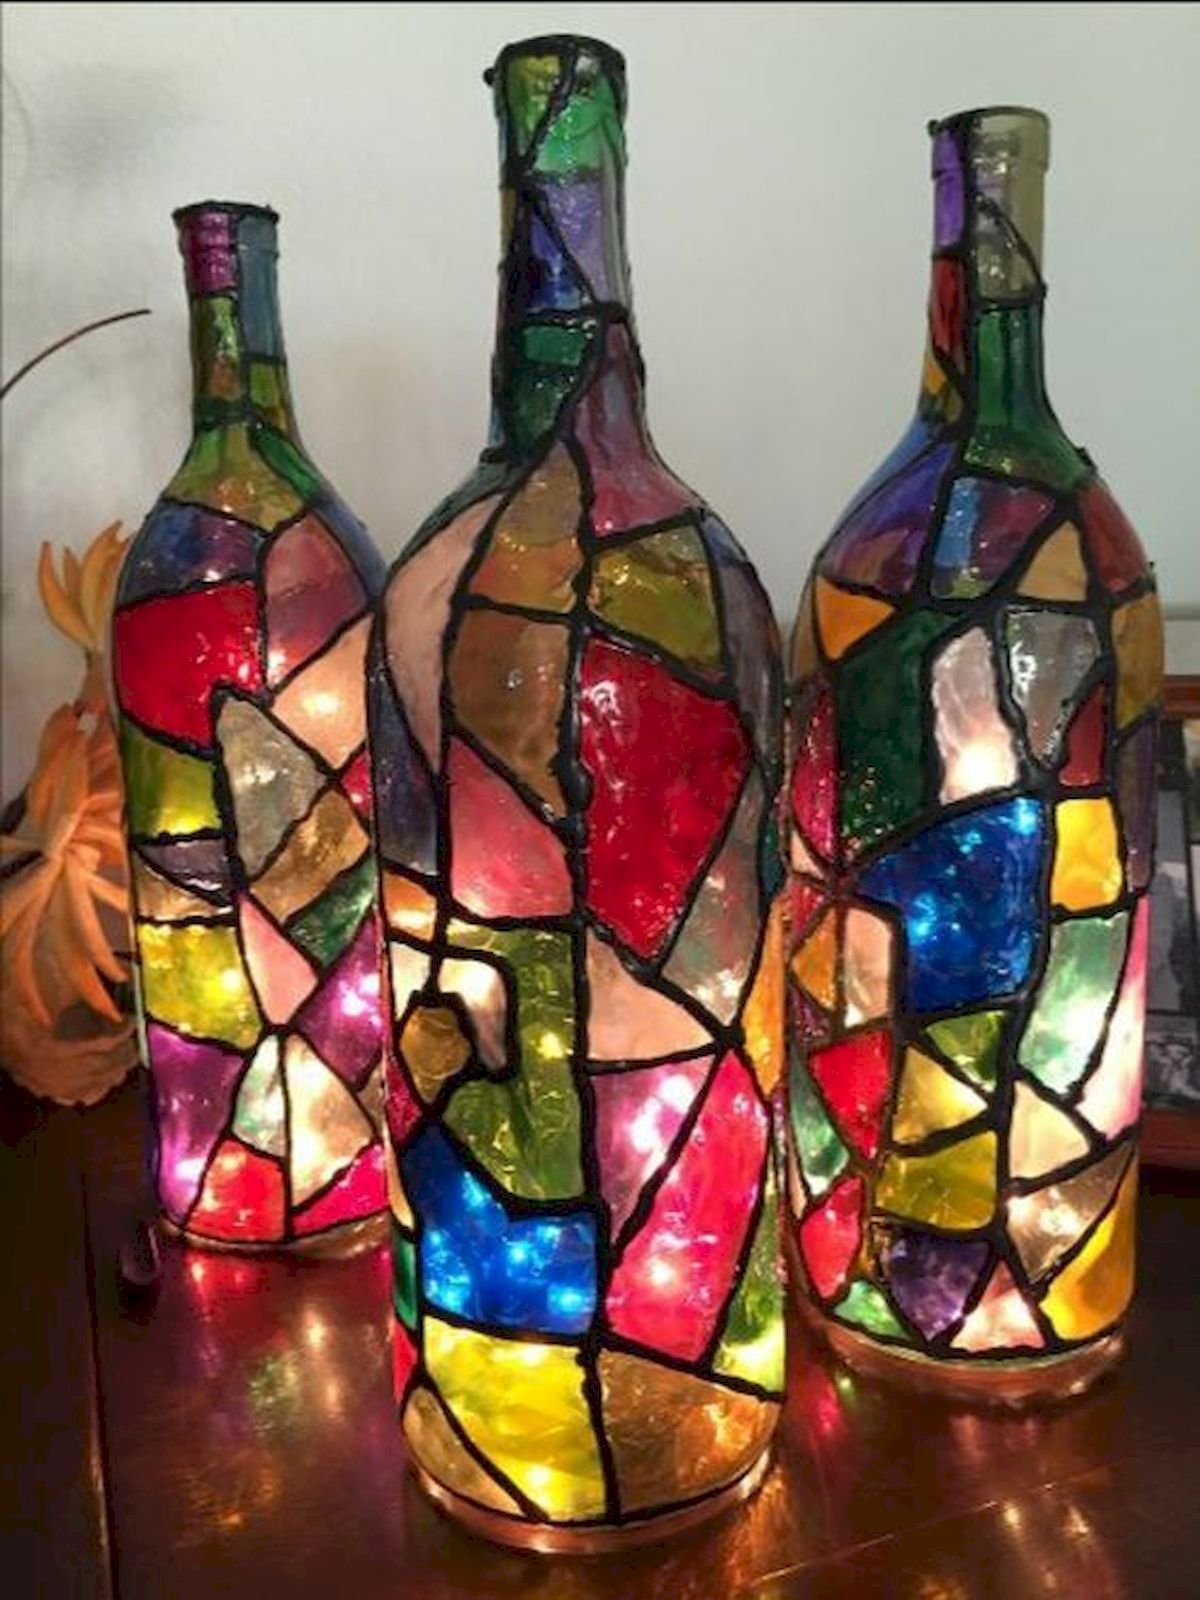 40 Fantastic Diy Wine Bottle Crafts Ideas With Lights Diy Bottle Crafts Wine Bottle Diy Crafts Bottle Crafts